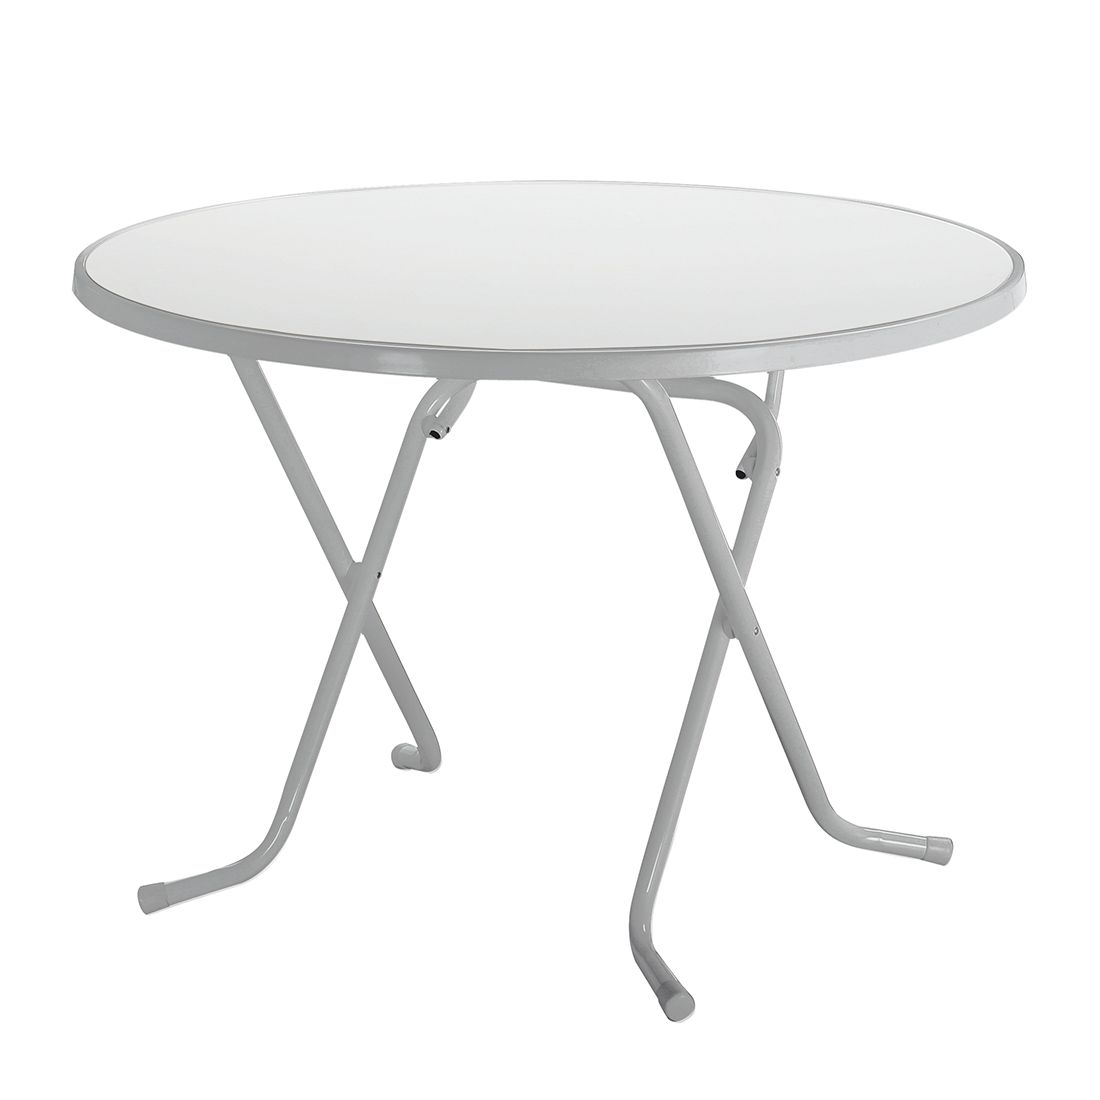 Tavolo pieghevole Primo - Tubi in acciaio Color argento 80 cm, Best Freizeitmöbel